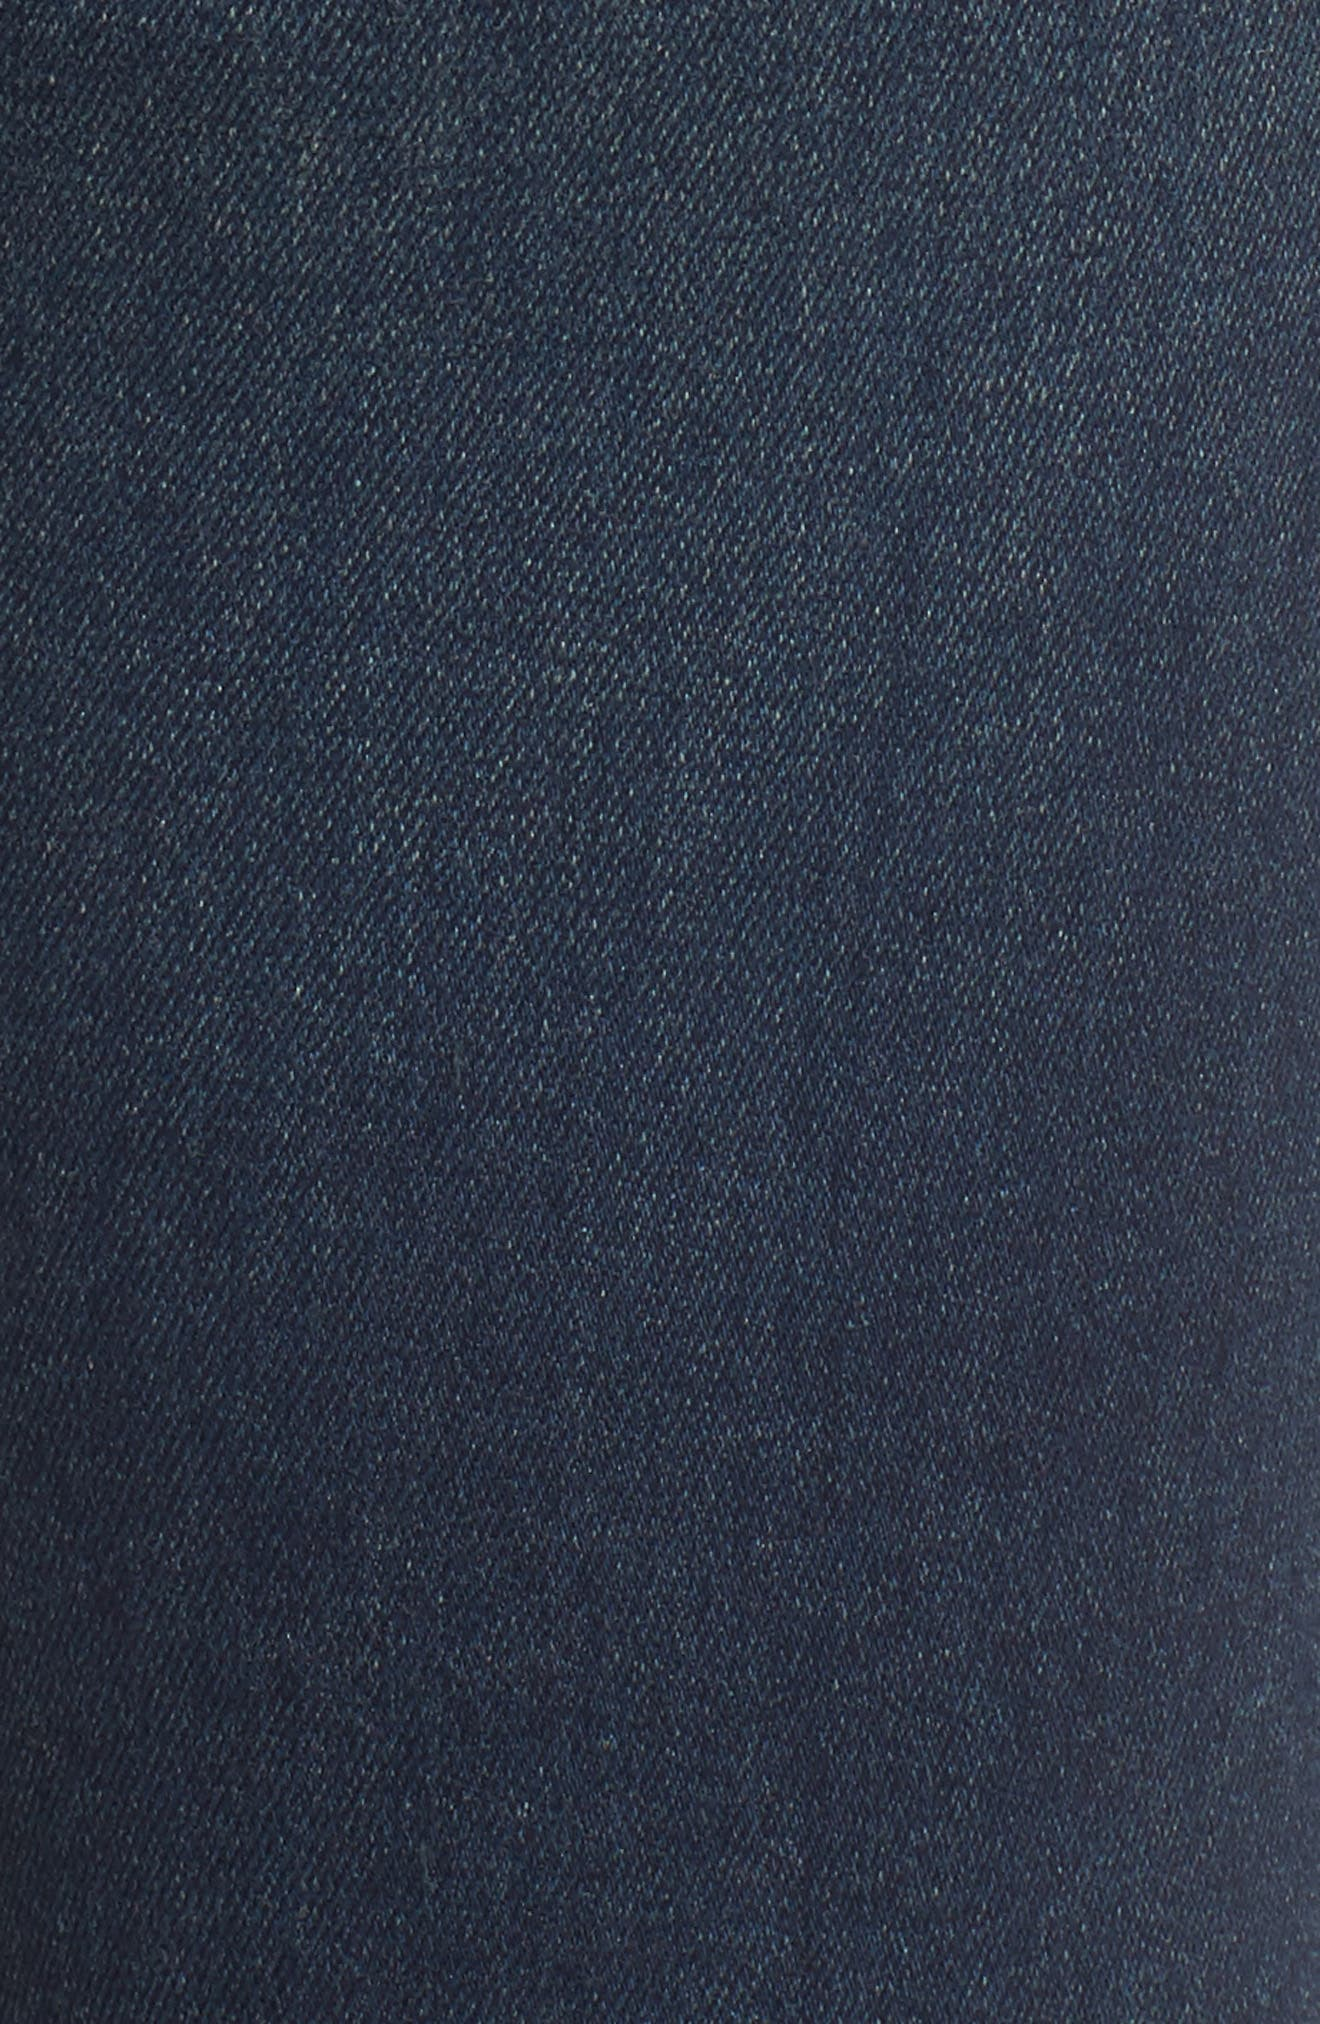 Alternate Image 5  - Citizens of Humanity Chrissy High Waist Skinny Jeans (Haze)